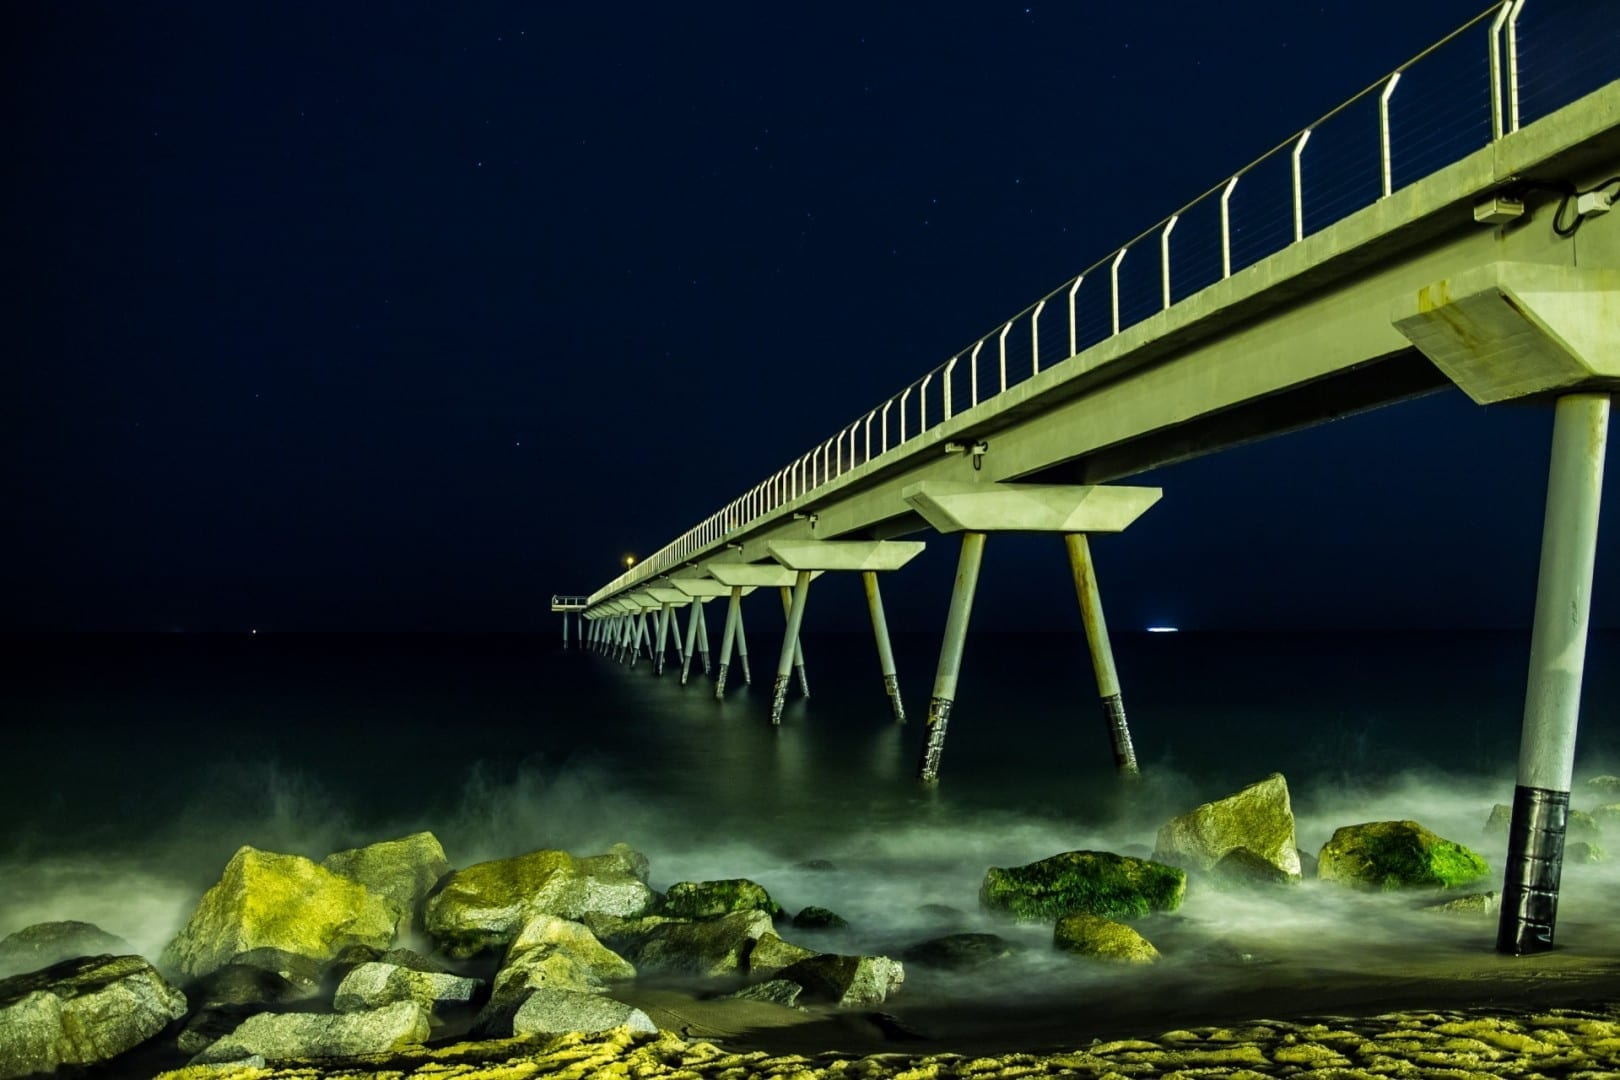 Pont del Petroli Badalona España